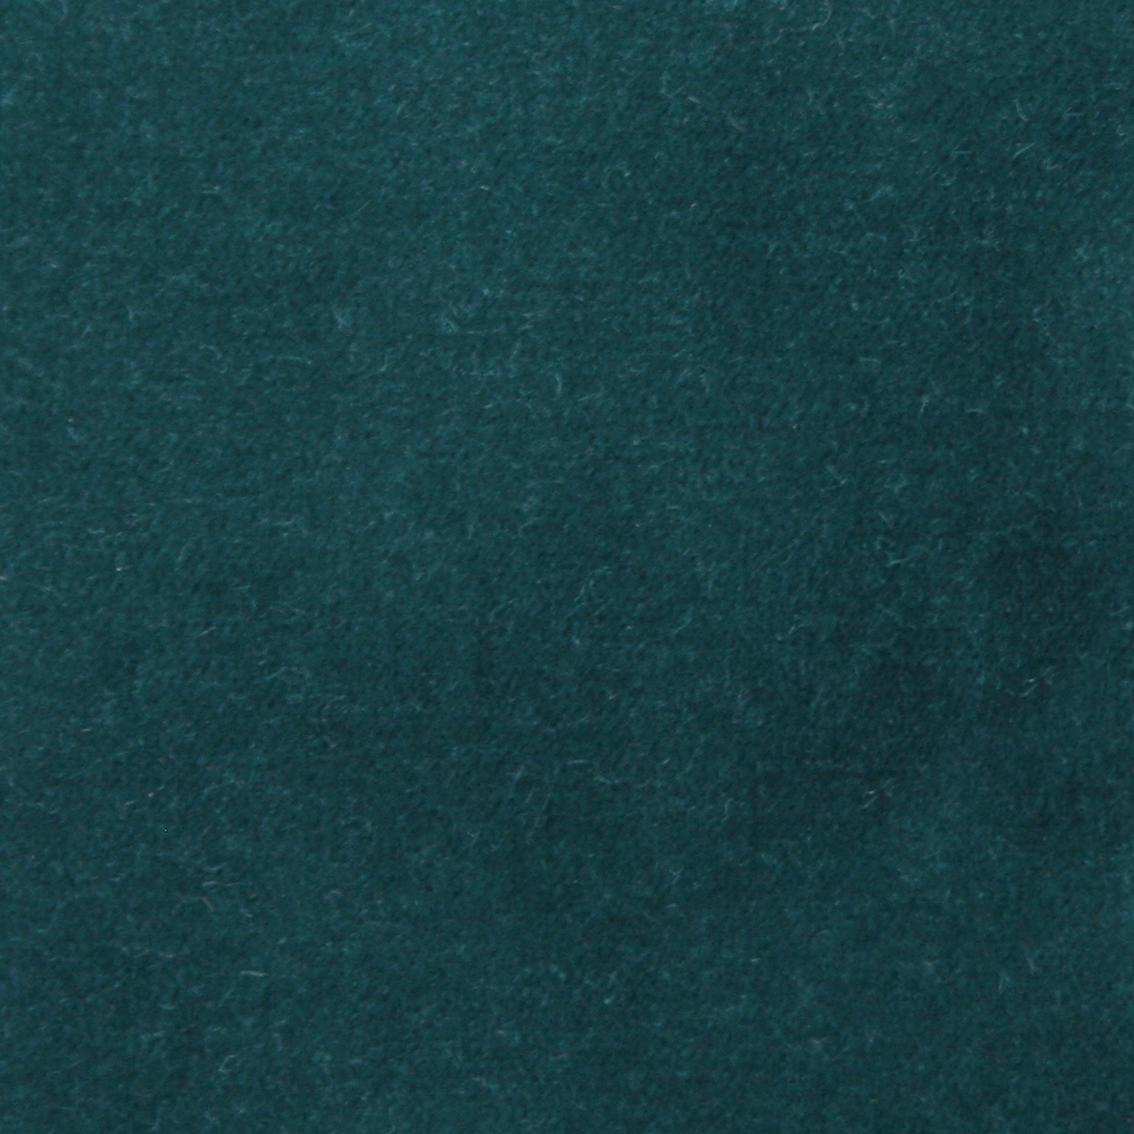 Teal Velvet Boeme Design Fabrics Cushions Furniture